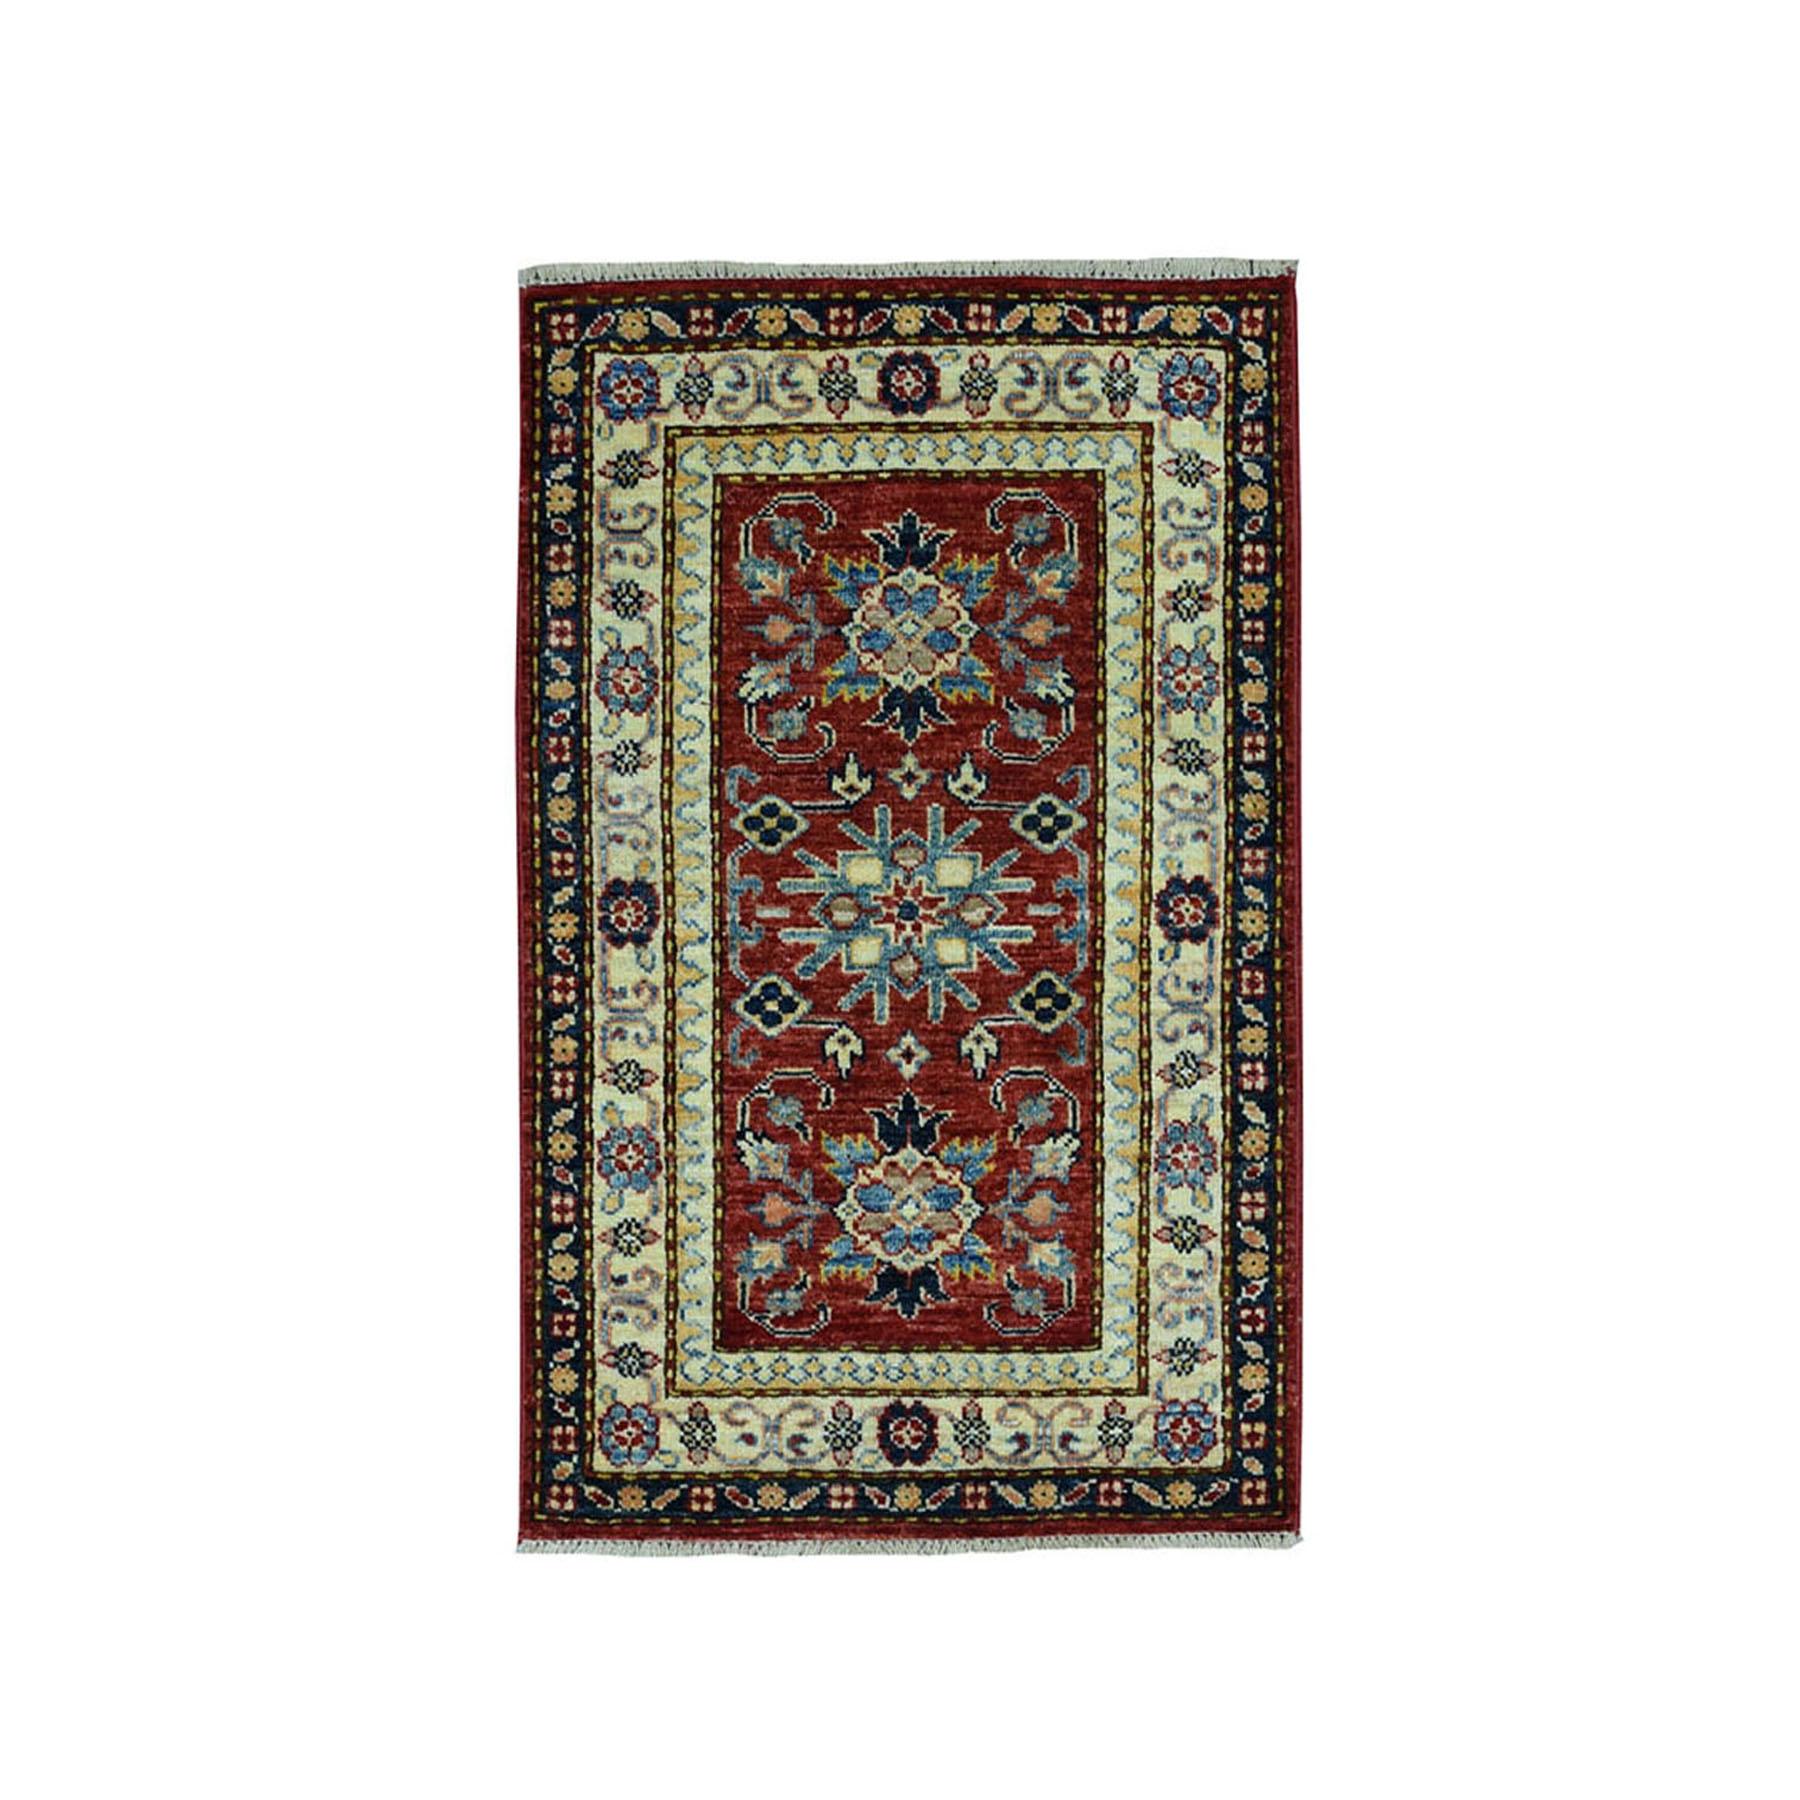 2'X3' Red Super Kazak Pure Wool Geometric Design Hand-Knotted Oriental Rug moae09a0